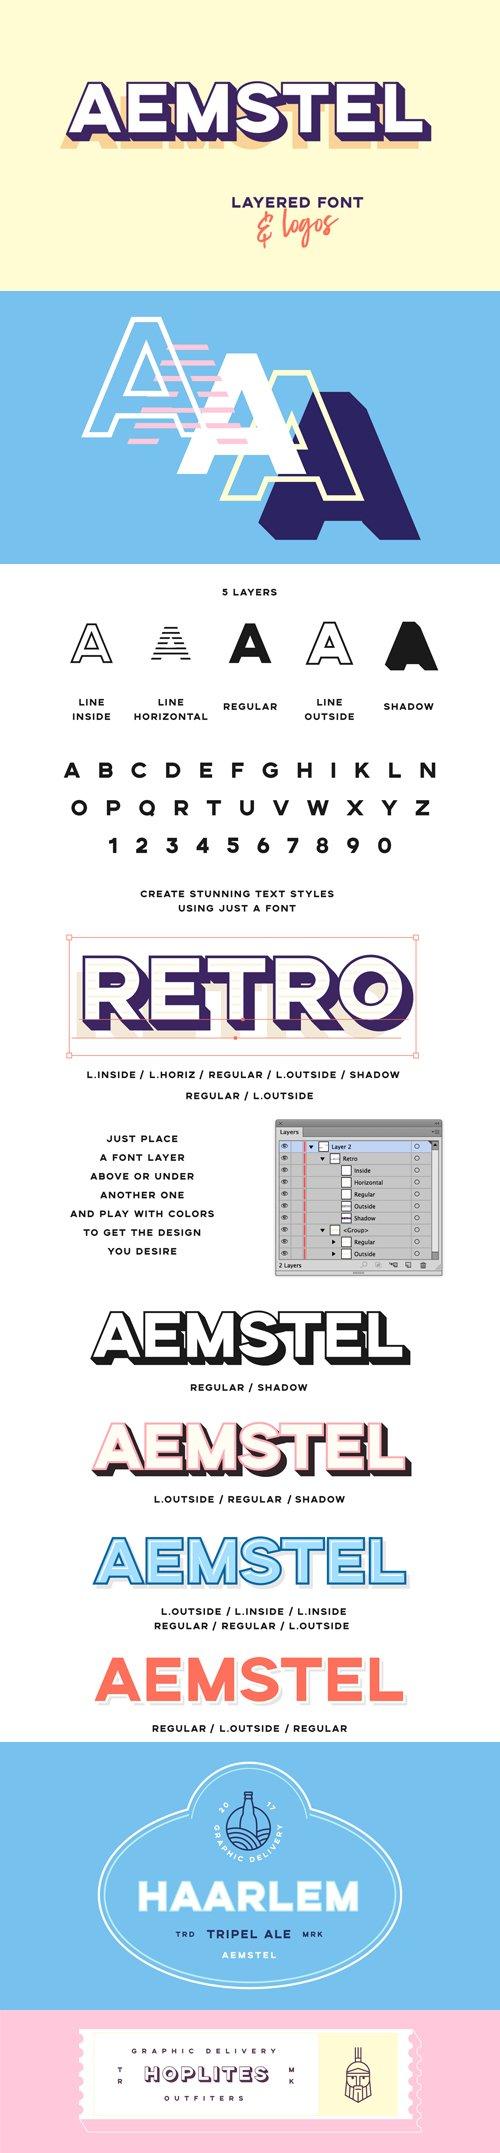 Aemstel Layered sans serif Font